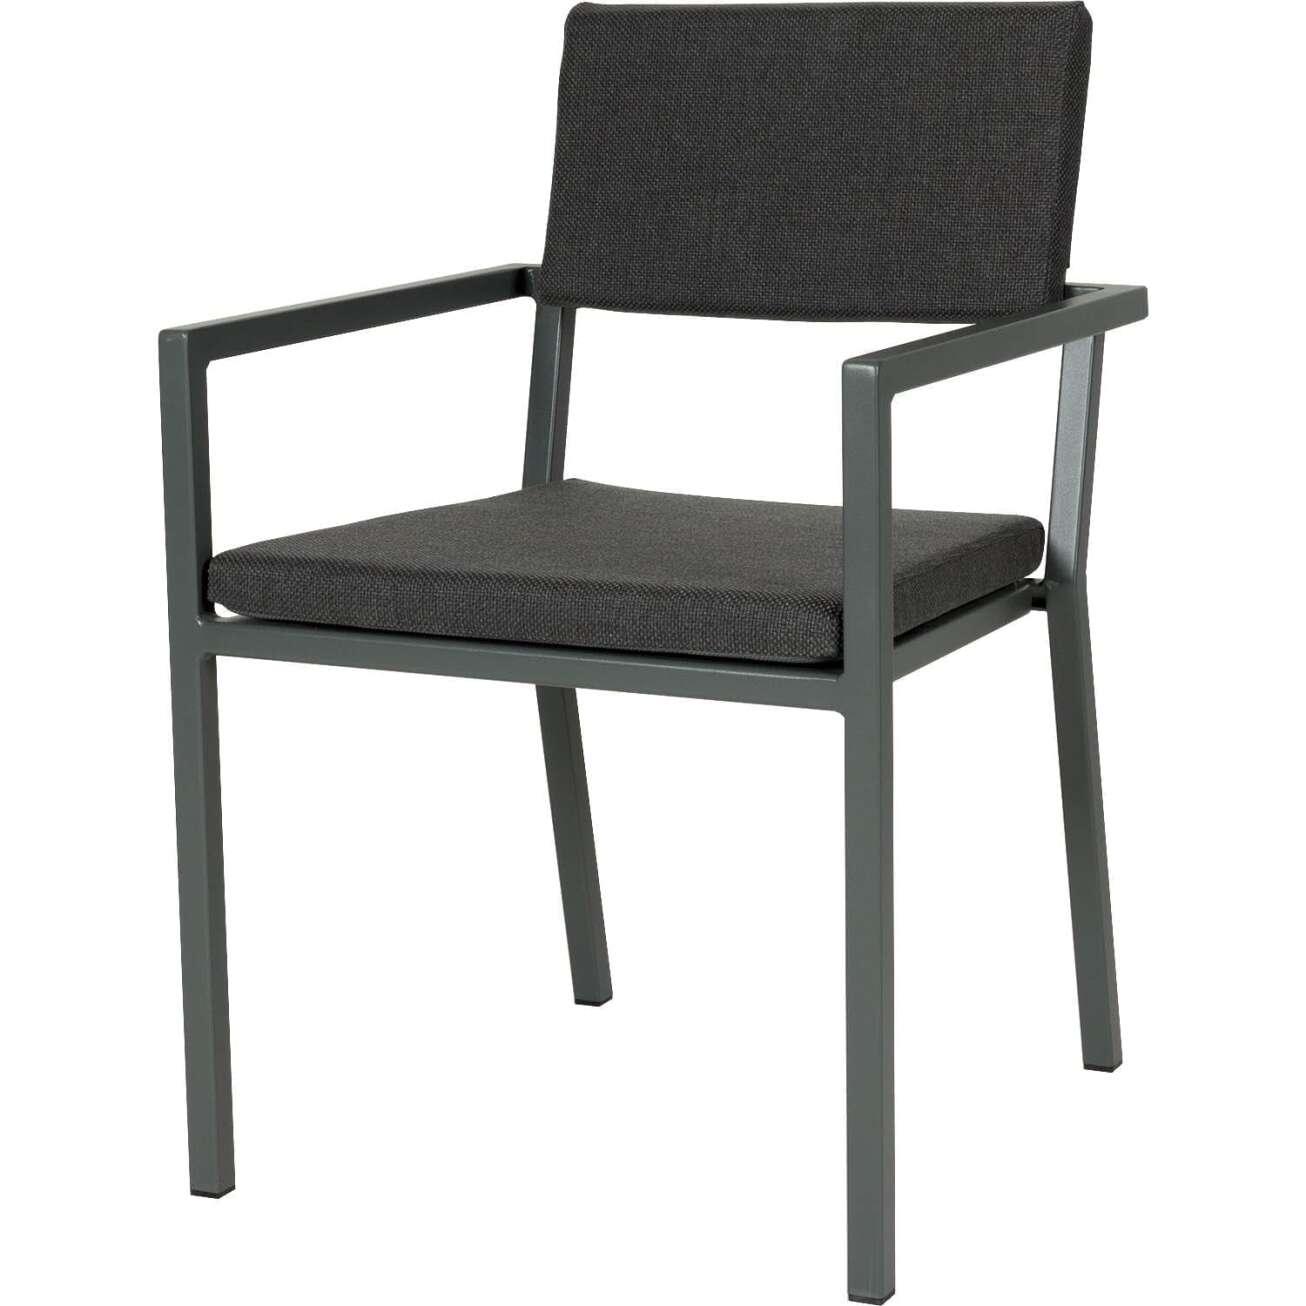 Sundays Frame spisestol i mørkgrå aluminium med svarte puter